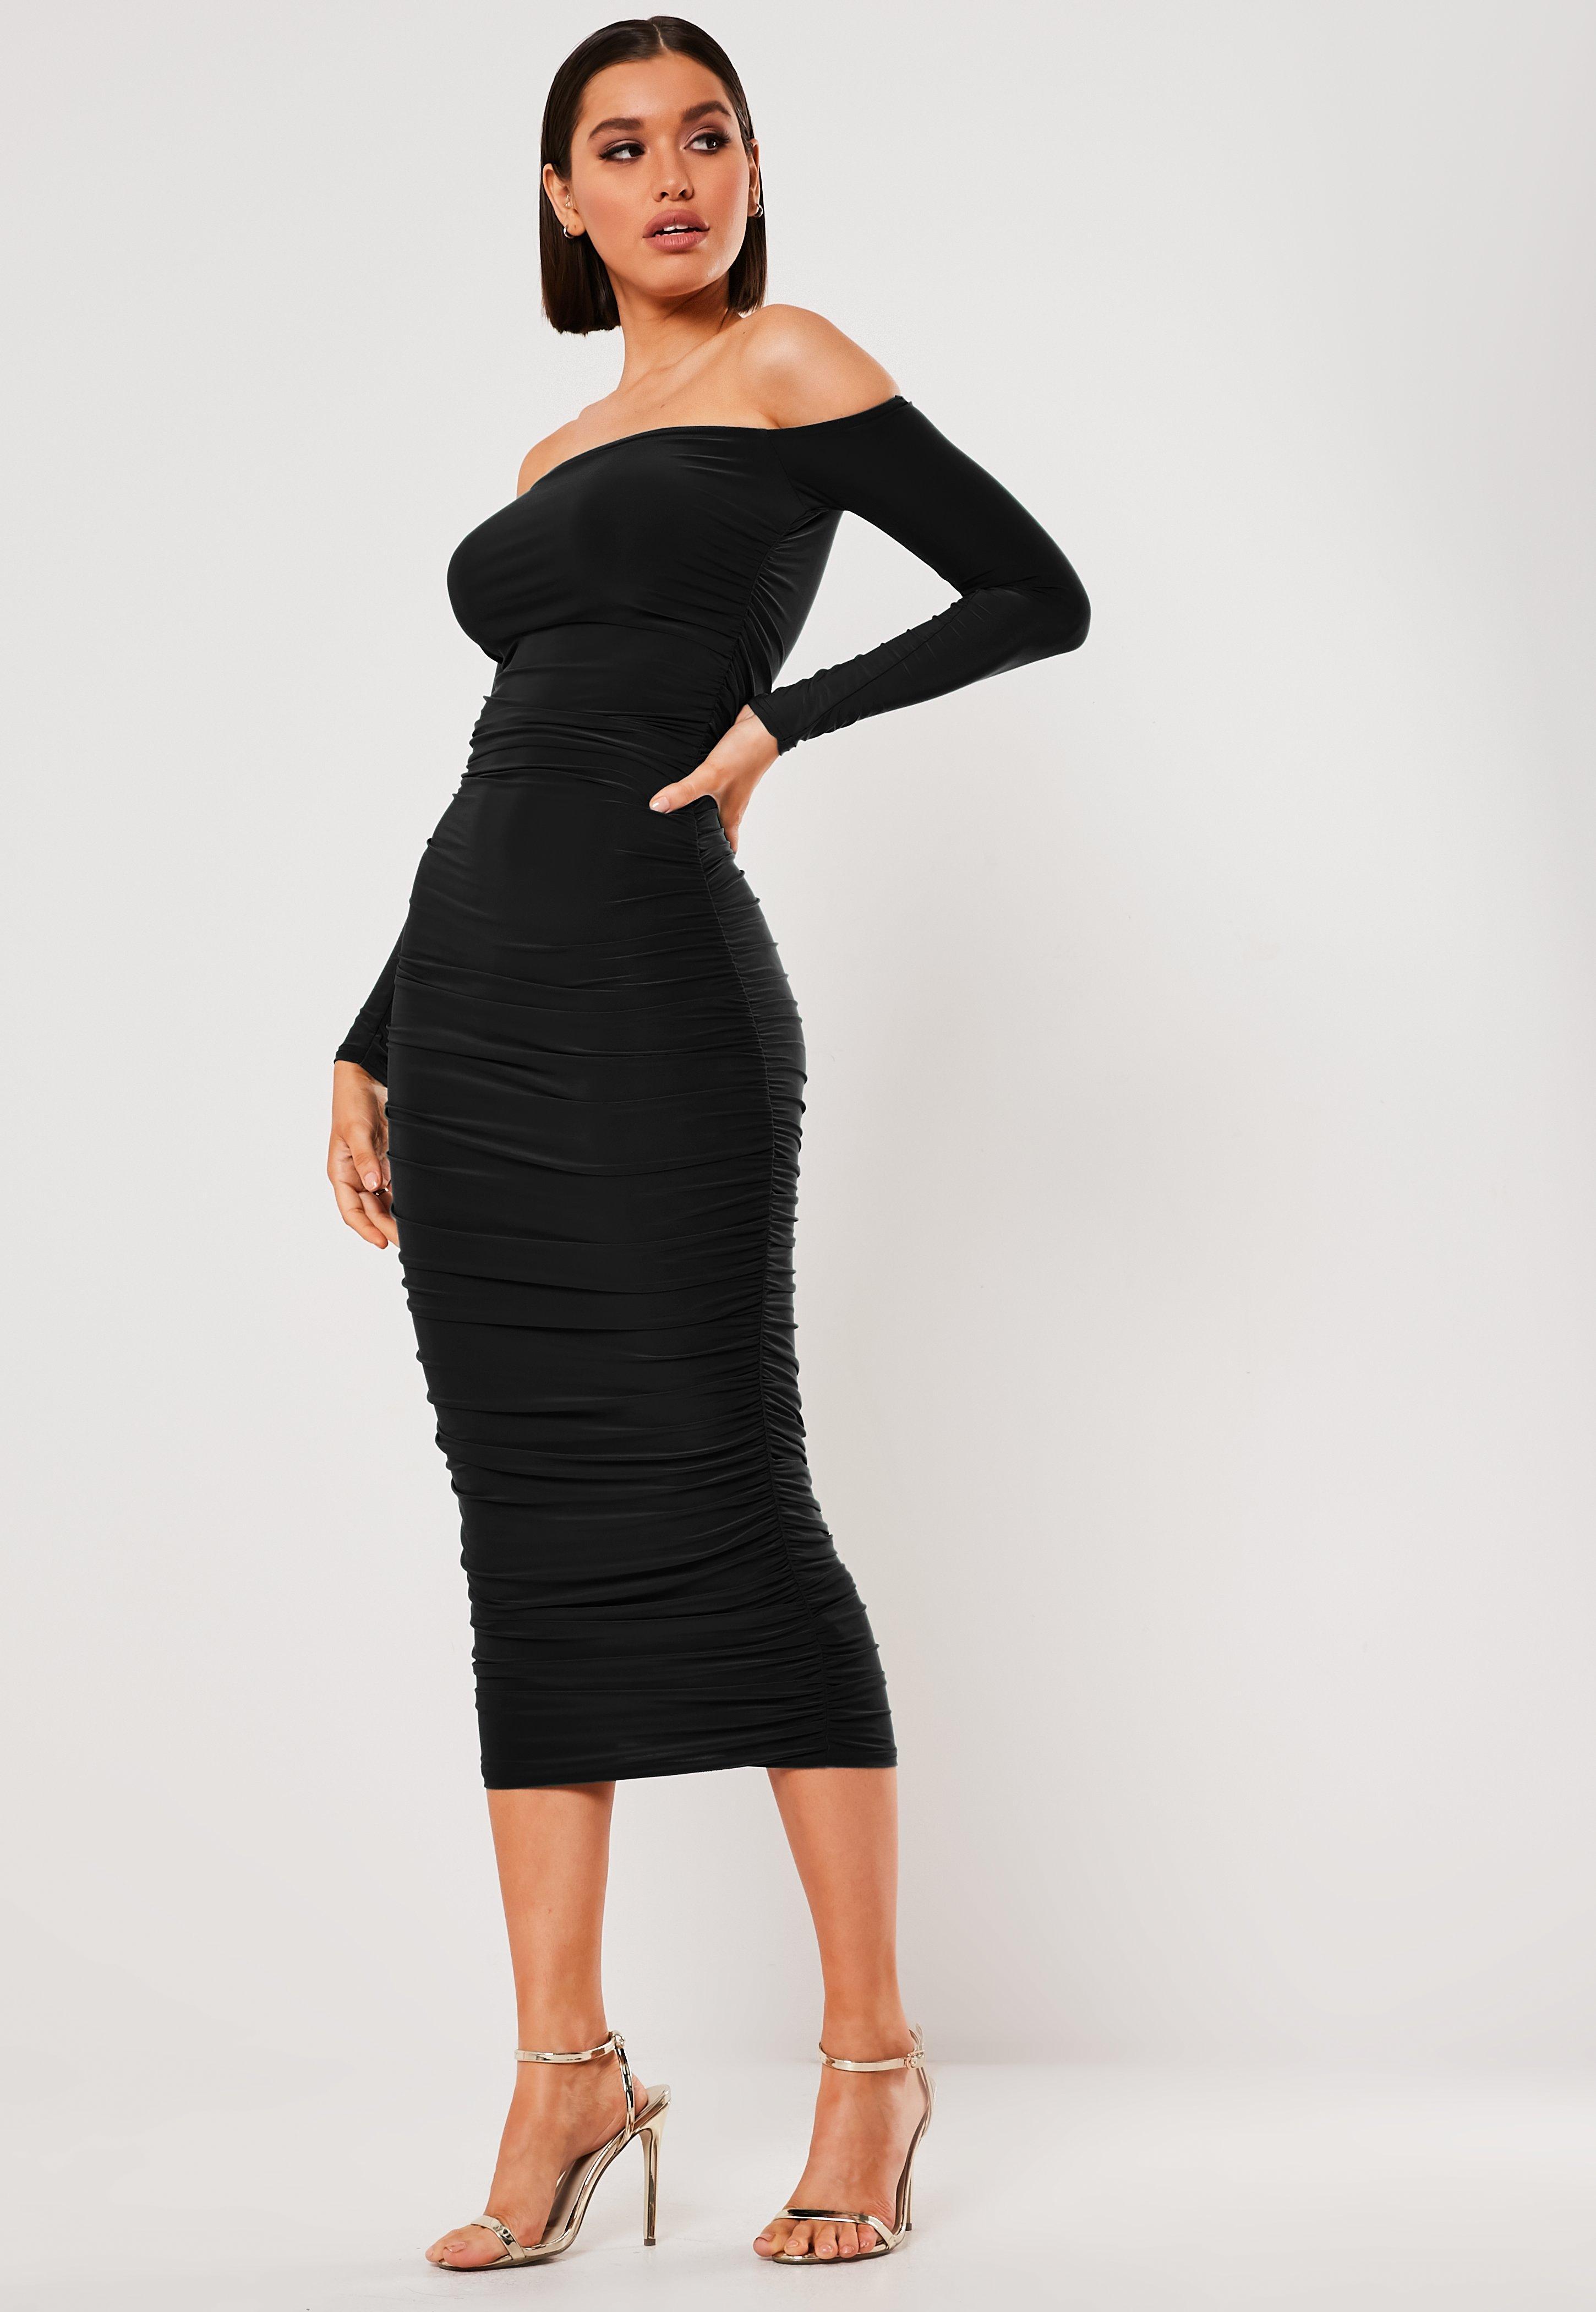 968493c1adea Bodycon Dresses